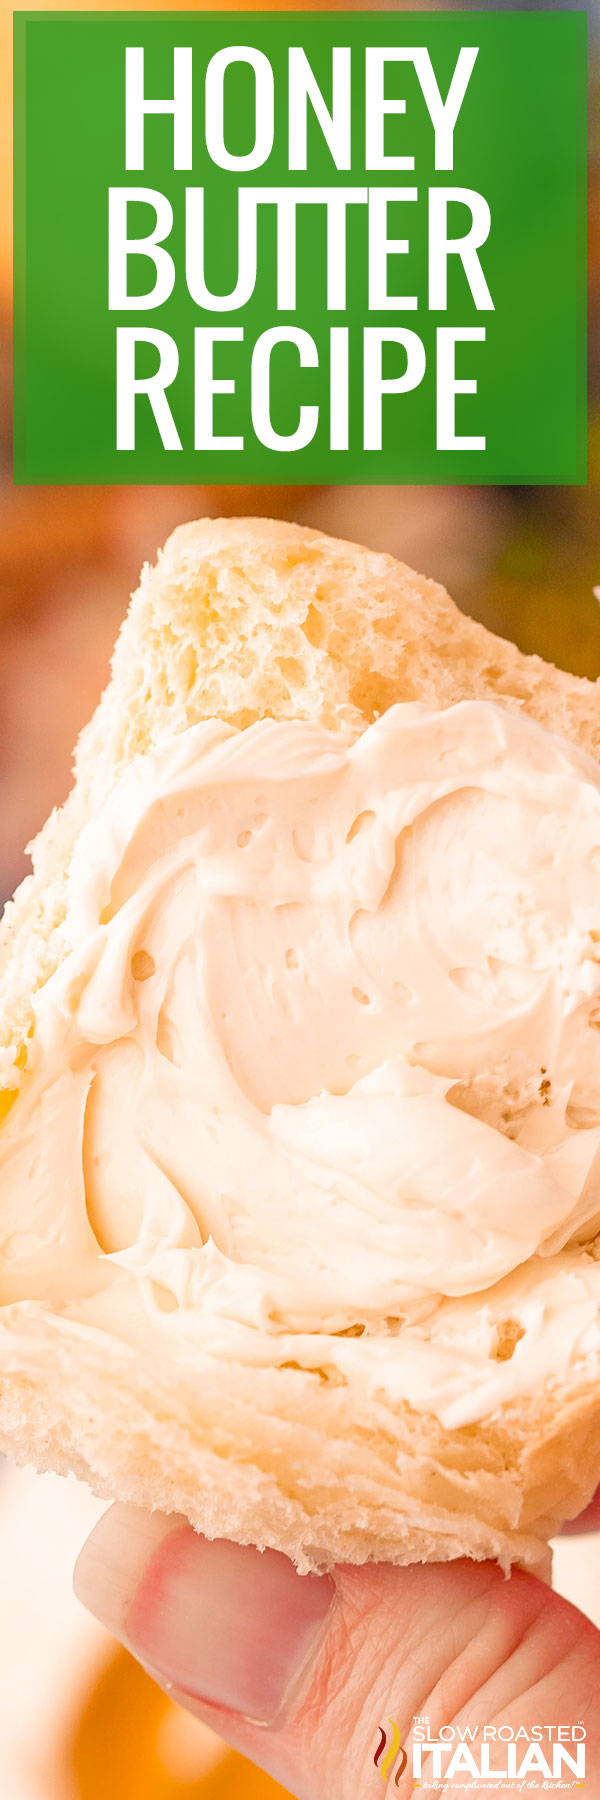 Honey Butter Recipe closeup